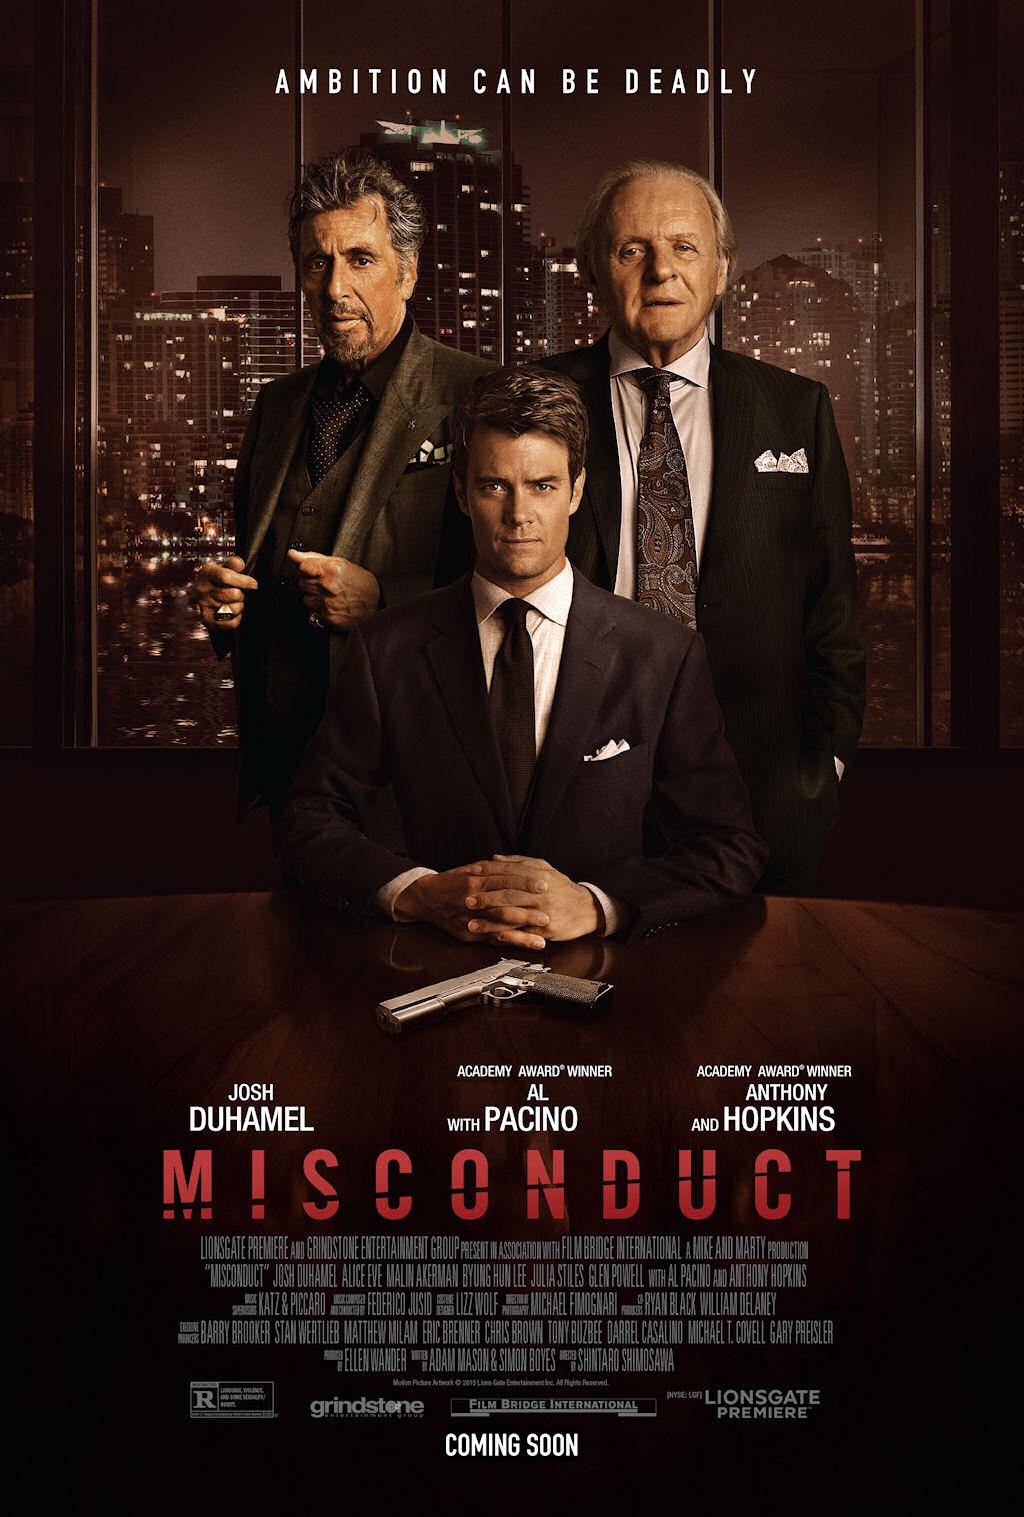 misconduct-movie-poster.jpg